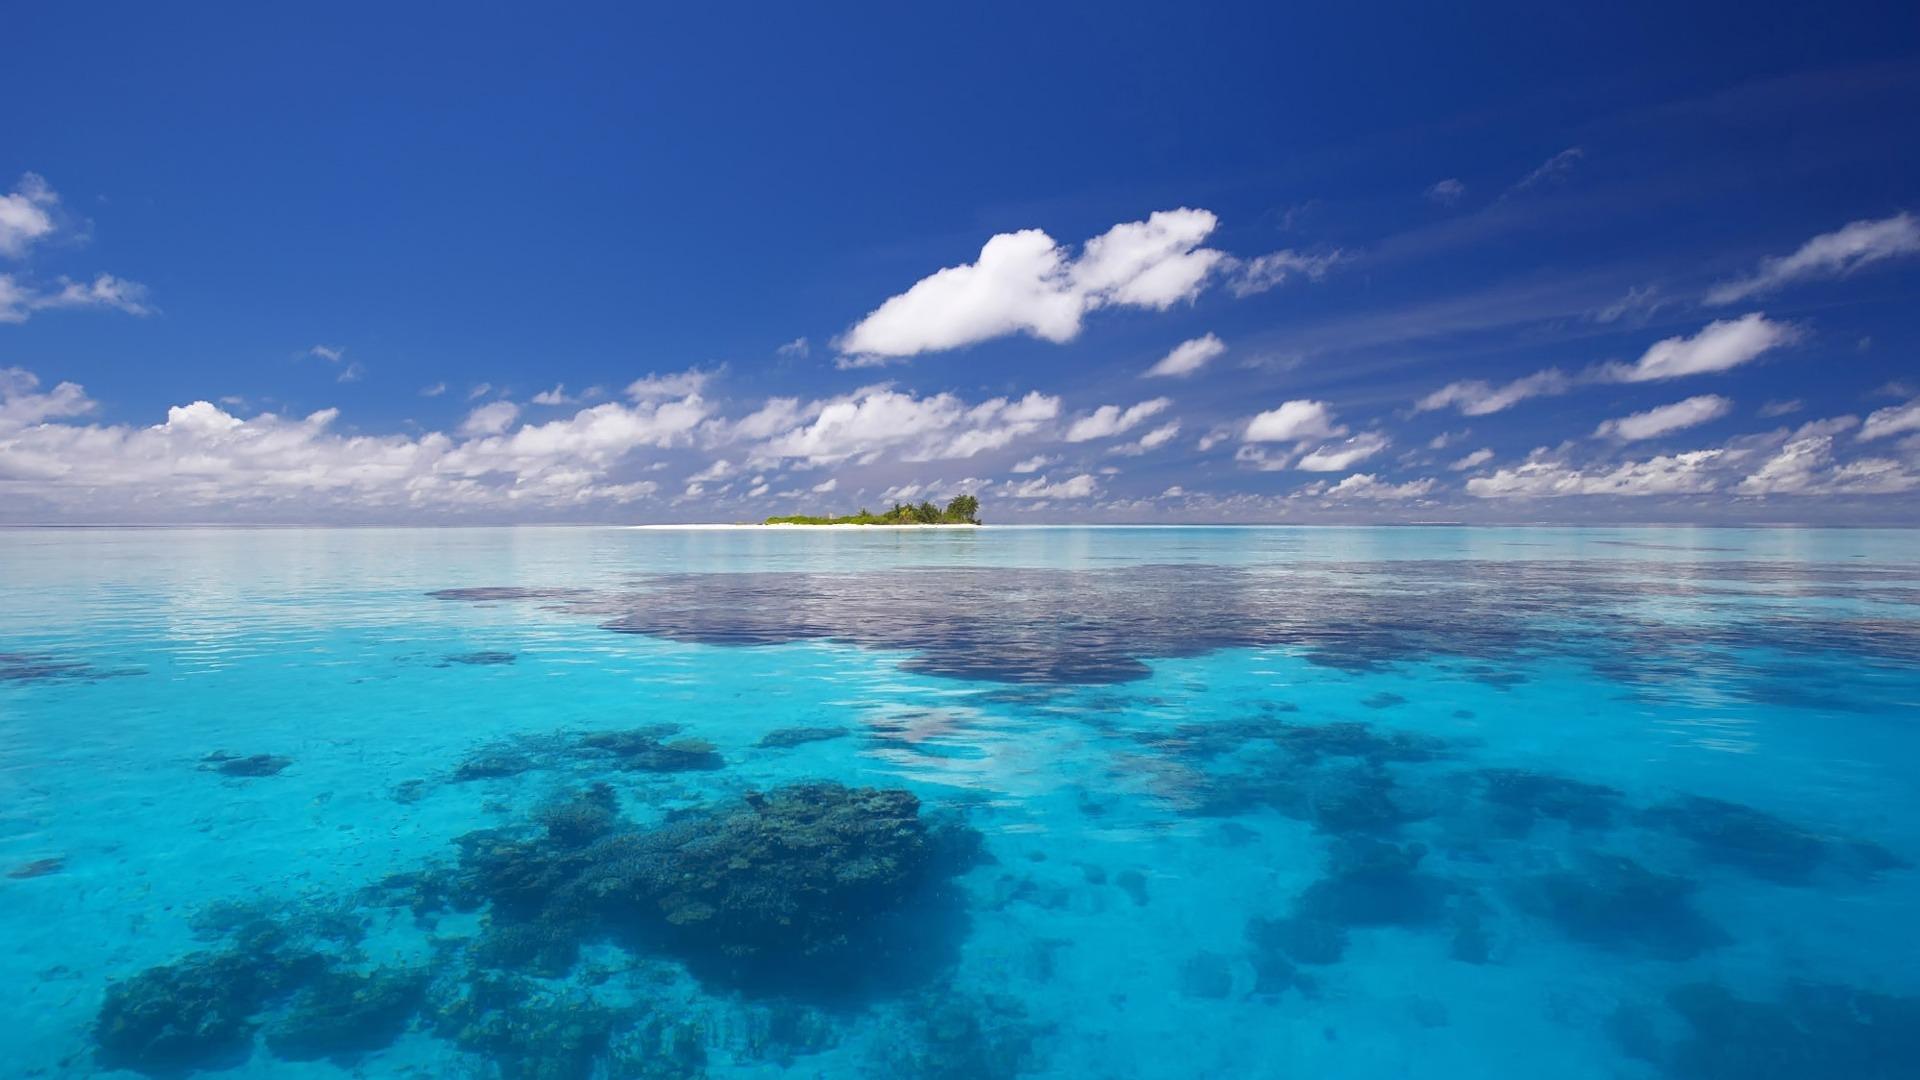 Ocean Landscape Wallpapers HD Pictures Live HD Wallpaper 1920x1080